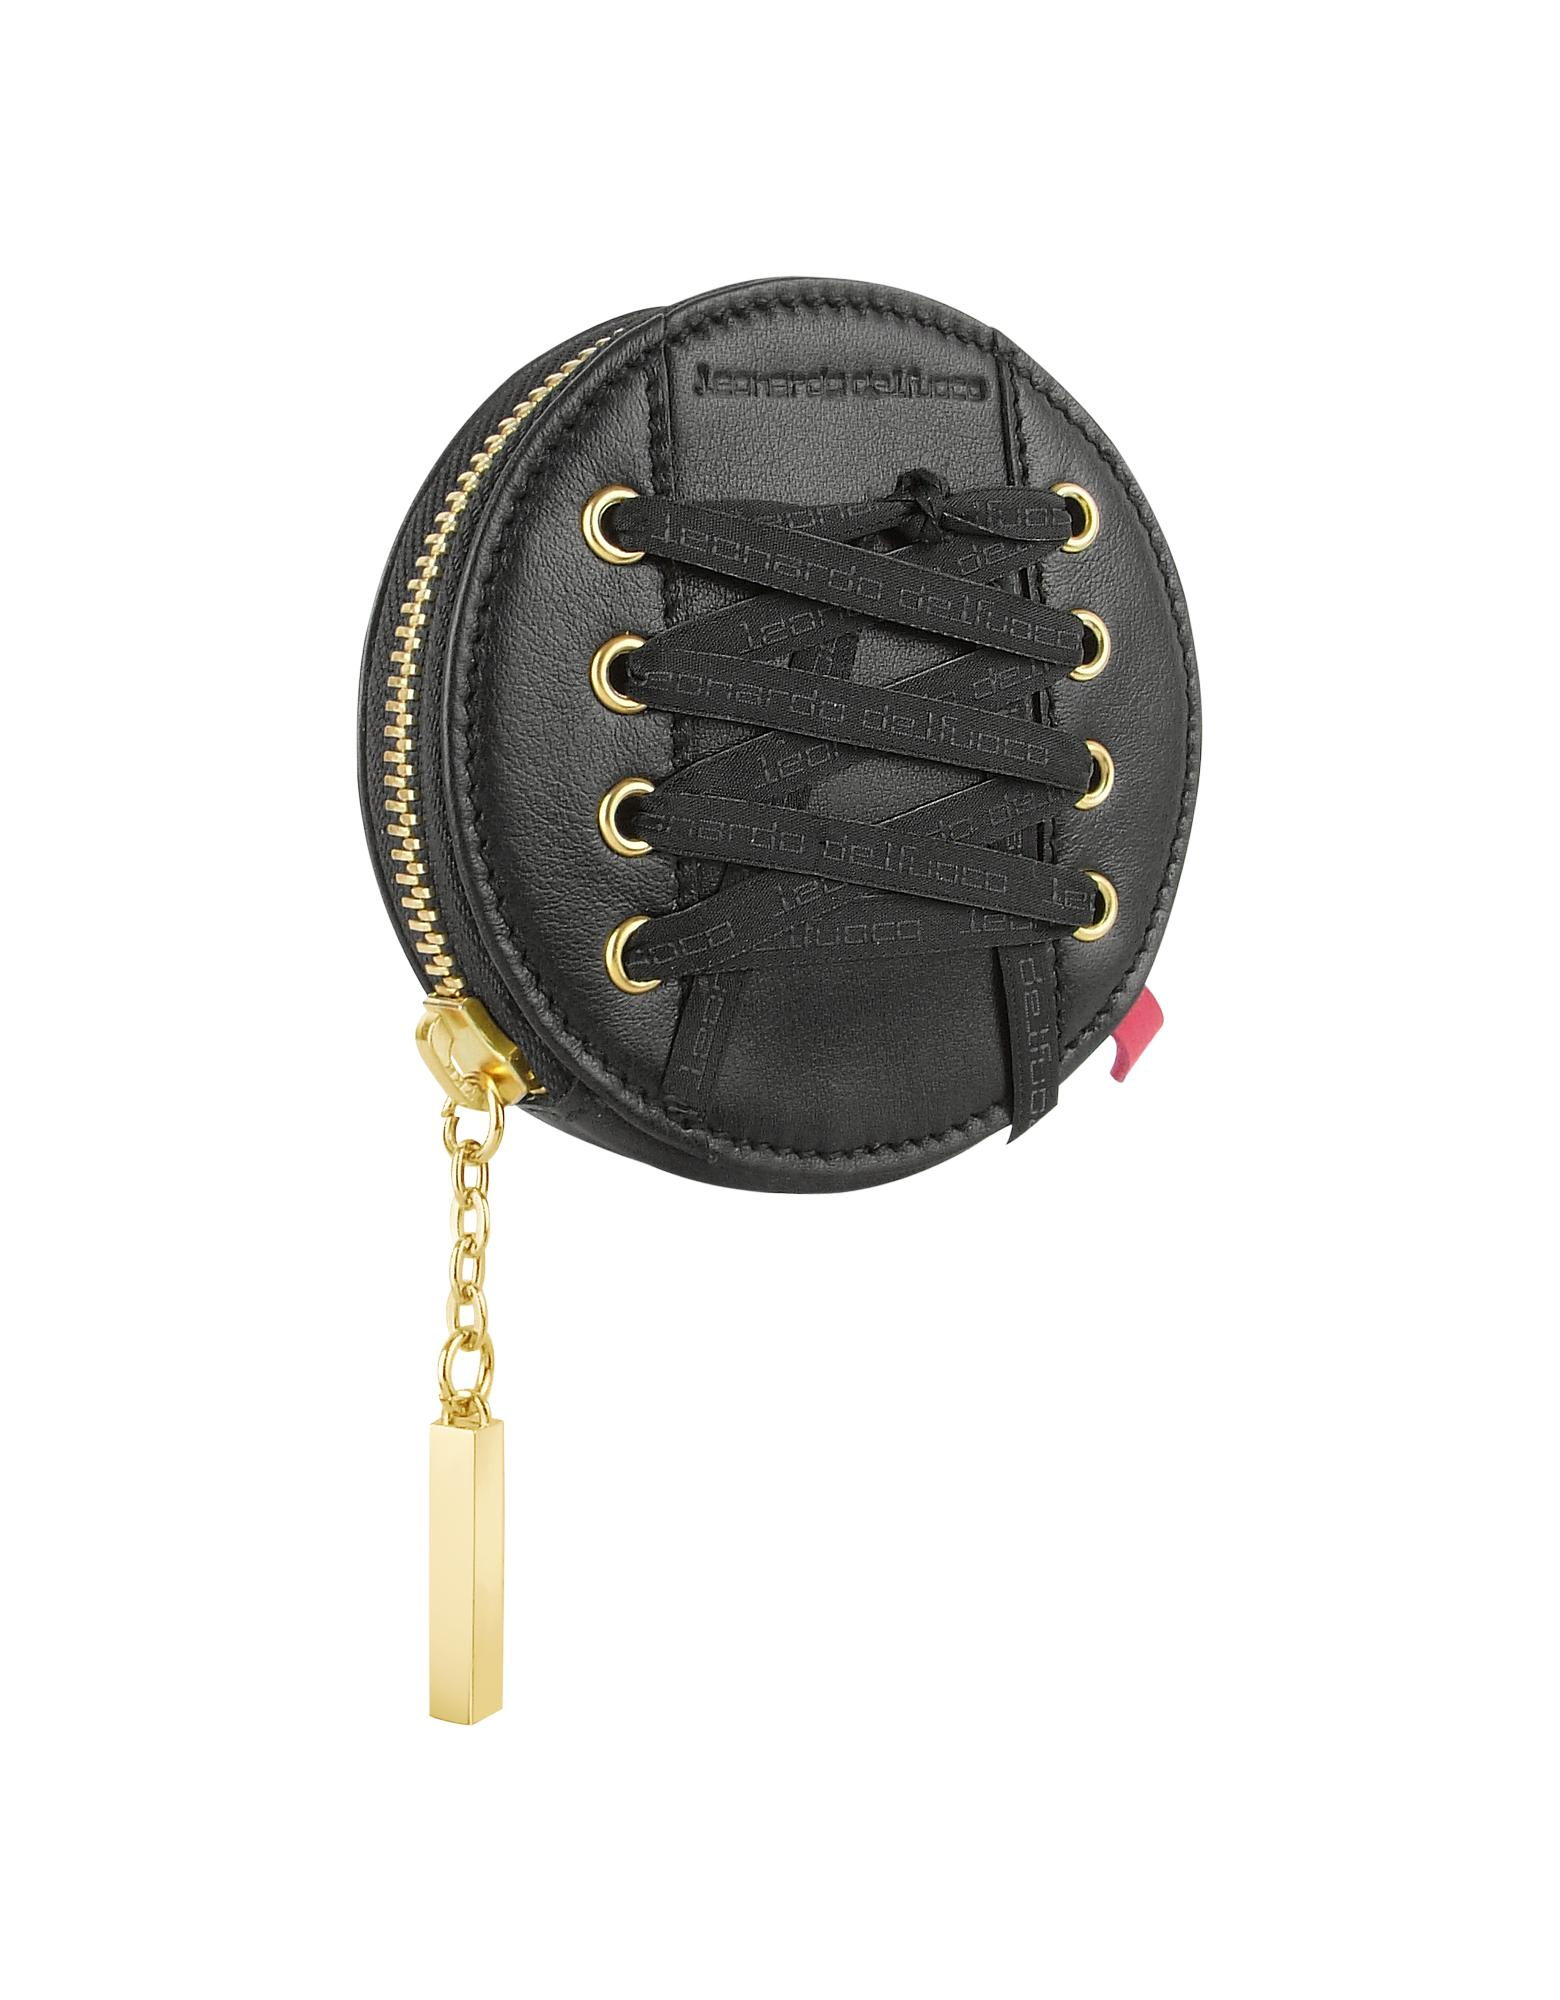 Leonardo Delfuoco  Black Round Leather Zip Around Coin Holder